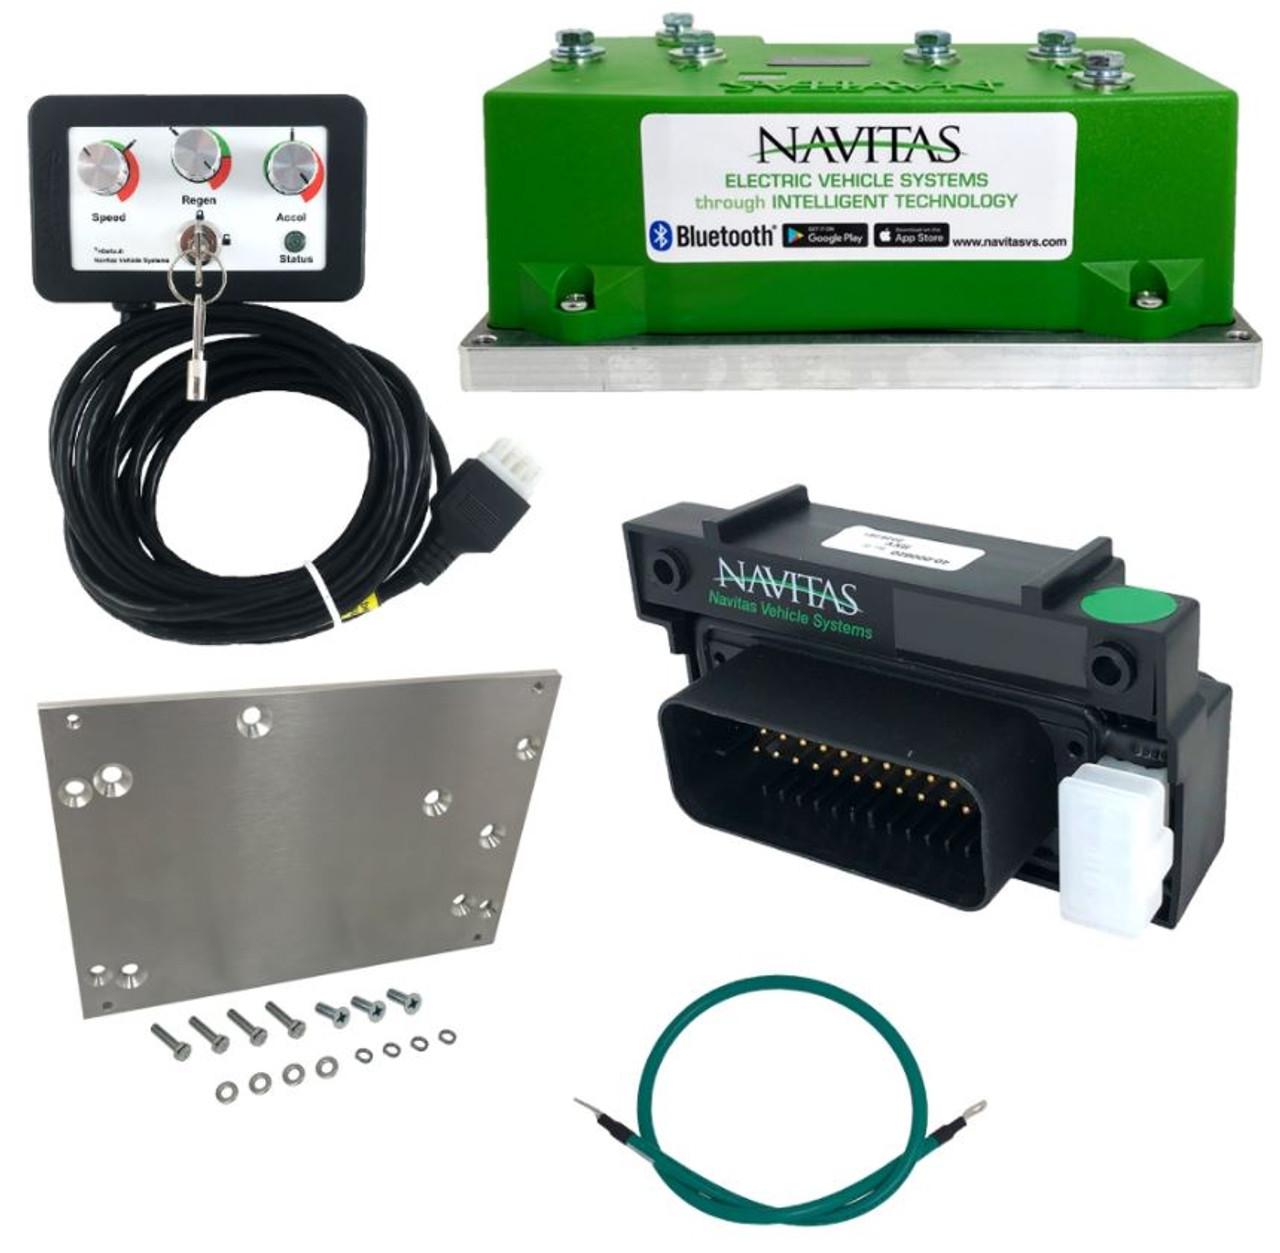 ICON Advanced EV Navitas 440-Amp 48-Volt AC Upgrade TAC2 Controller Kit w/Bluetooth